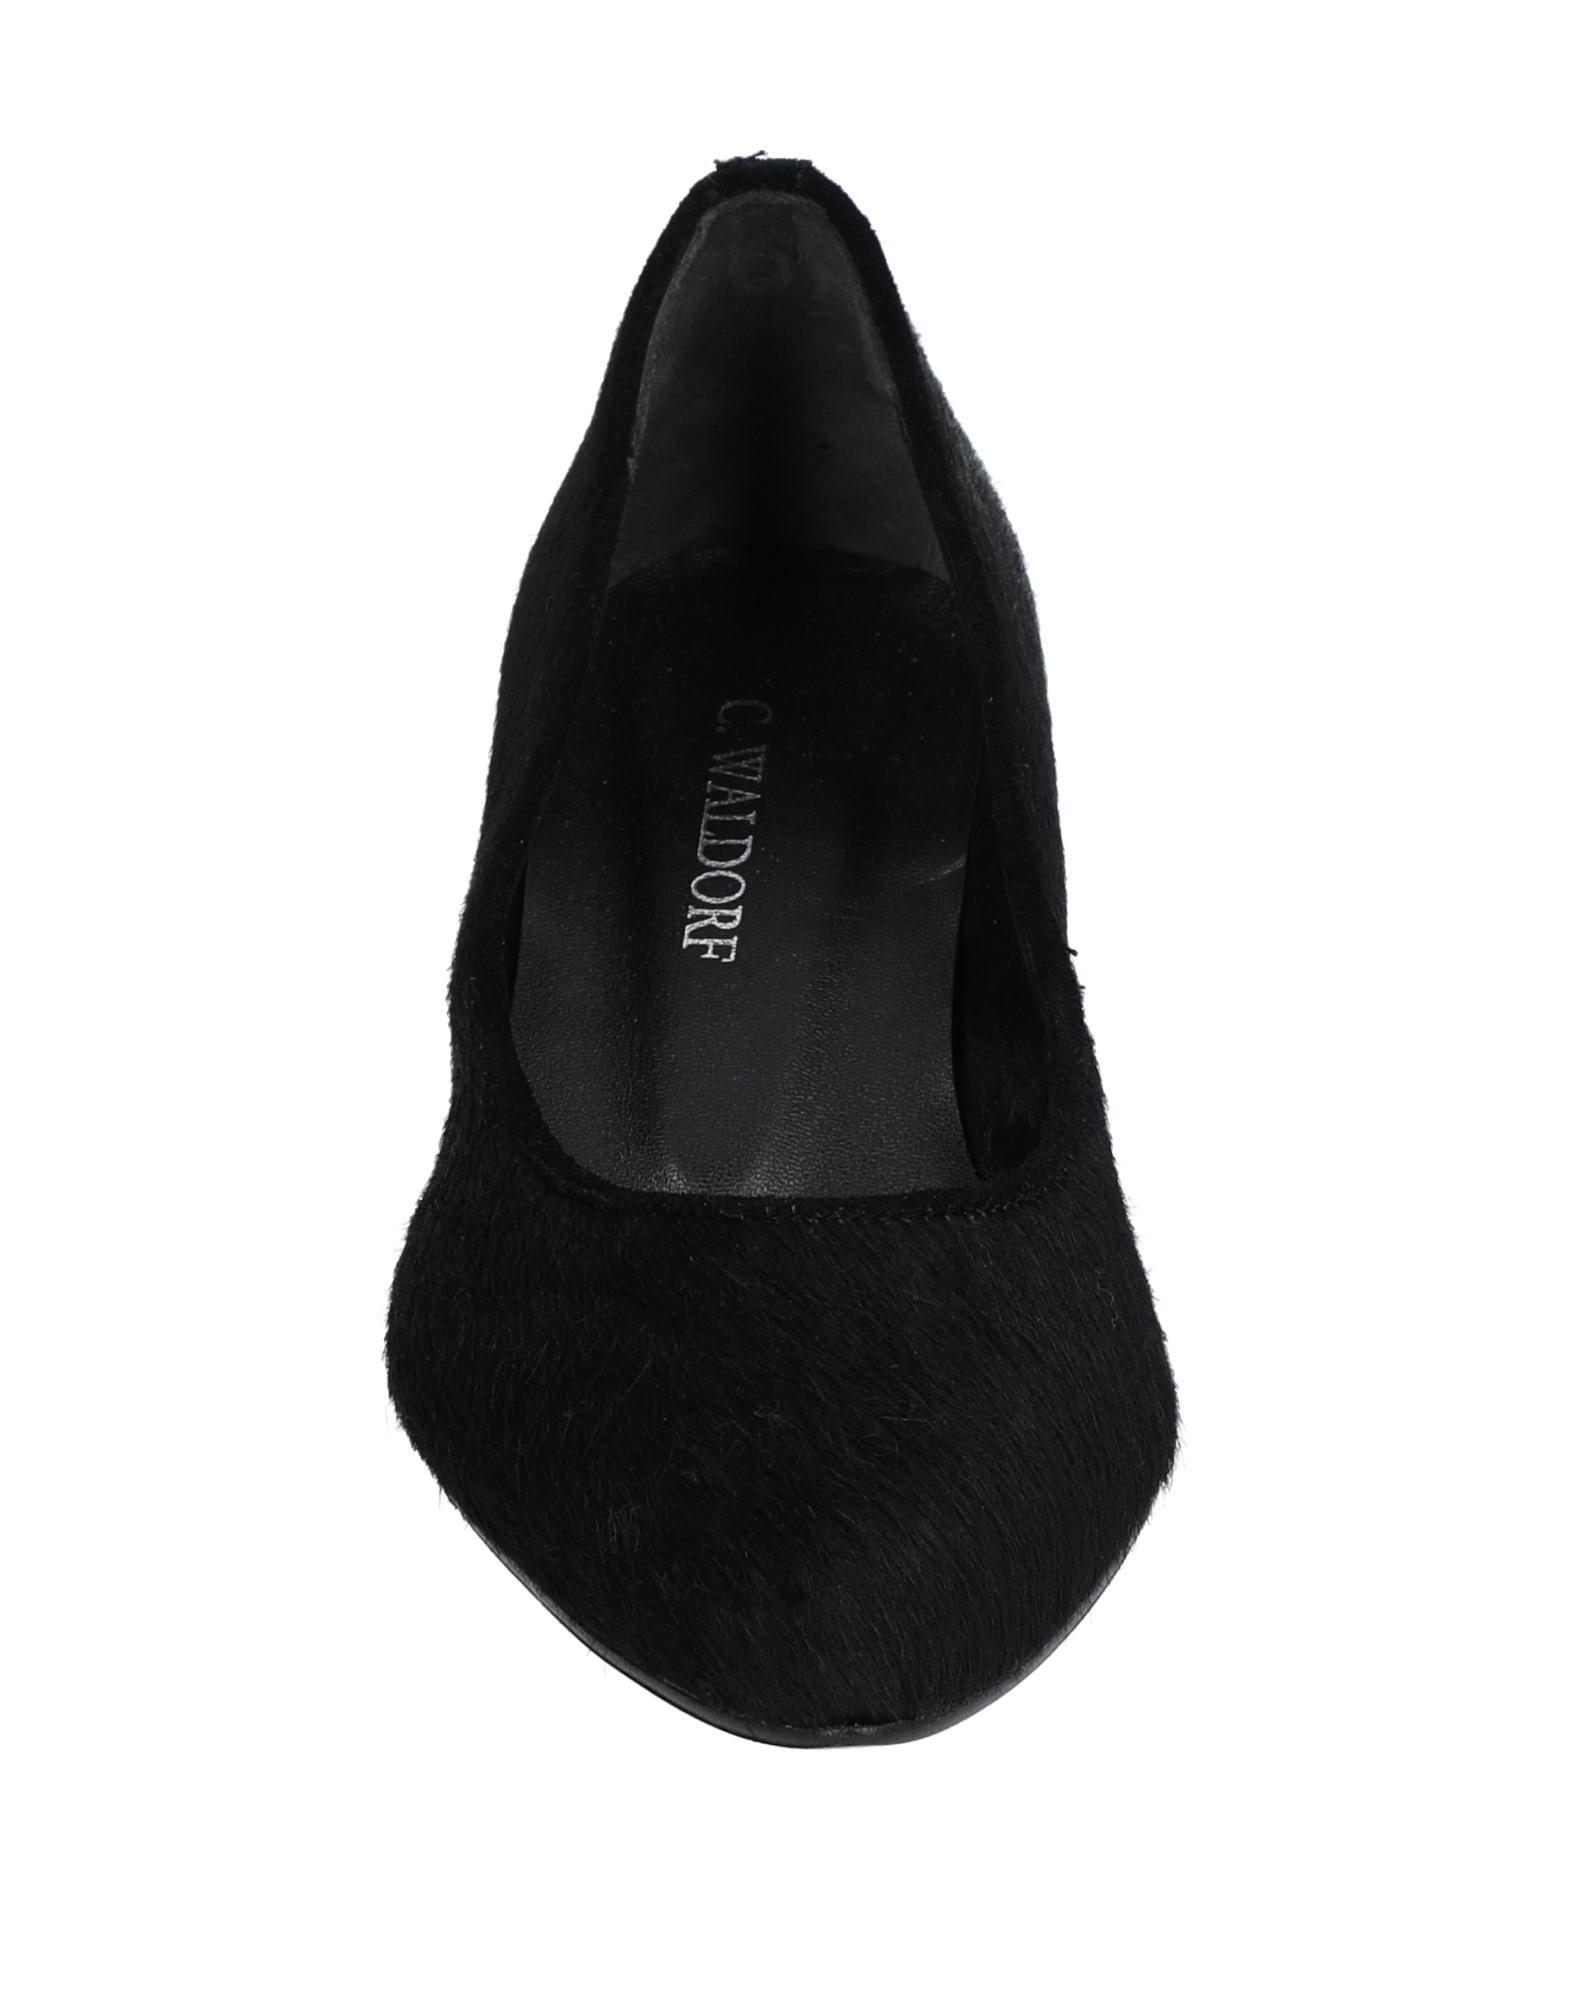 C.Waldorf Pumps Damen beliebte  11534148KS Gute Qualität beliebte Damen Schuhe 319f84